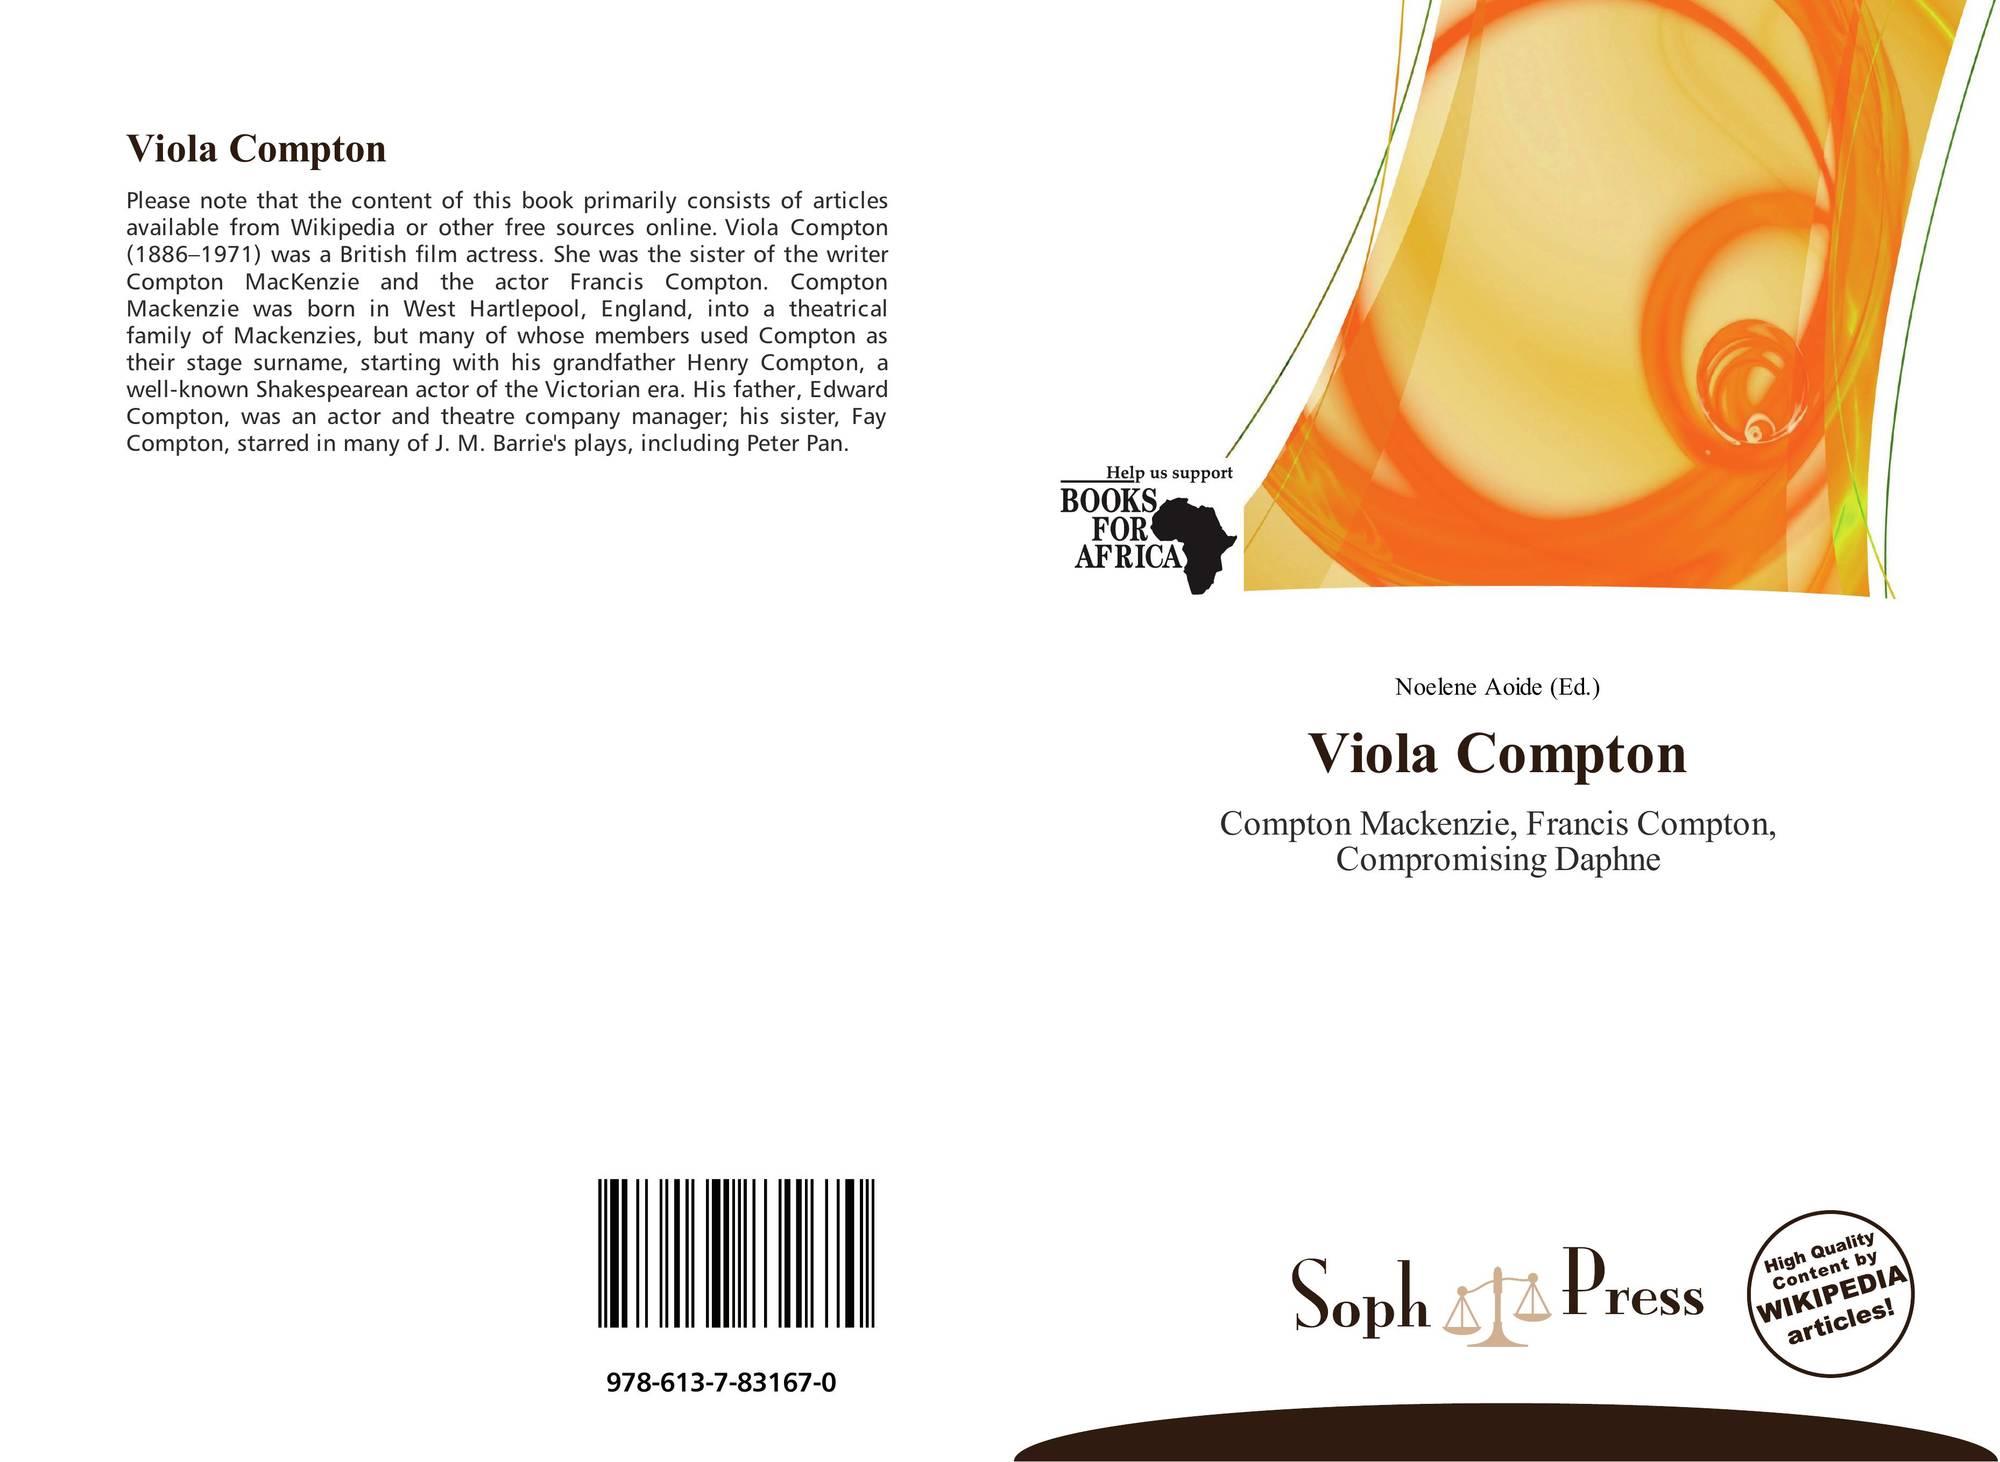 Viola Compton Viola Compton new foto